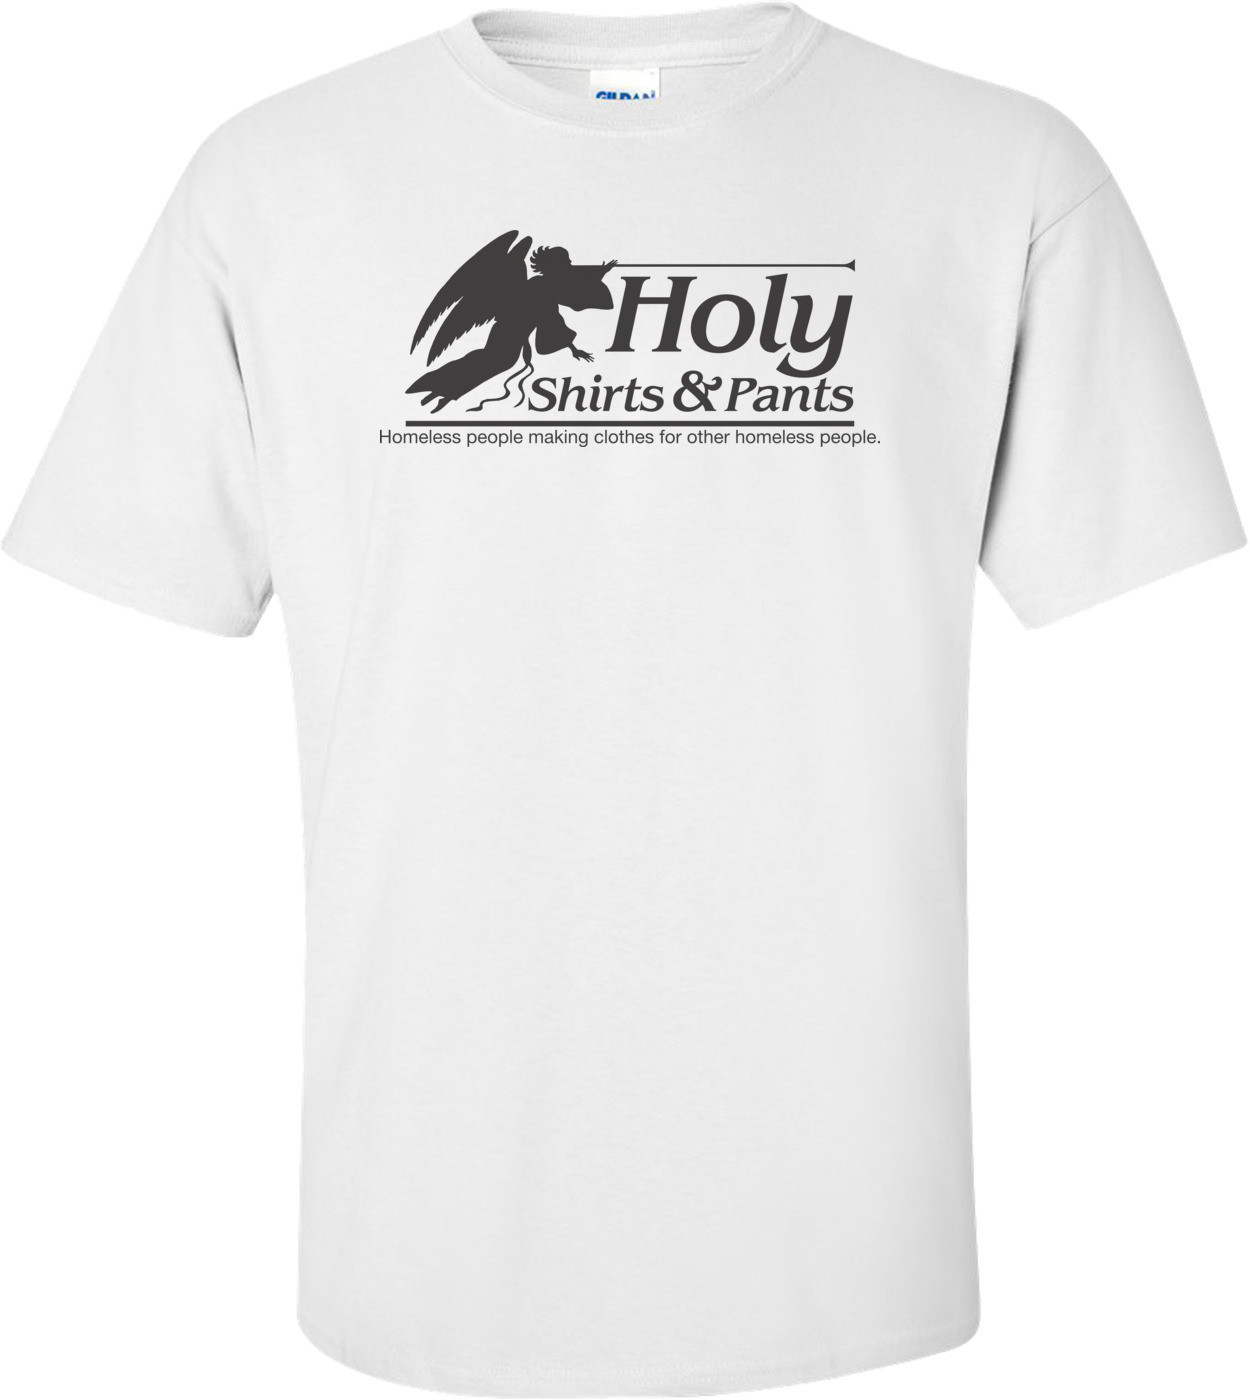 Holy Shirts And Pants Wedding Crashers T-shirt